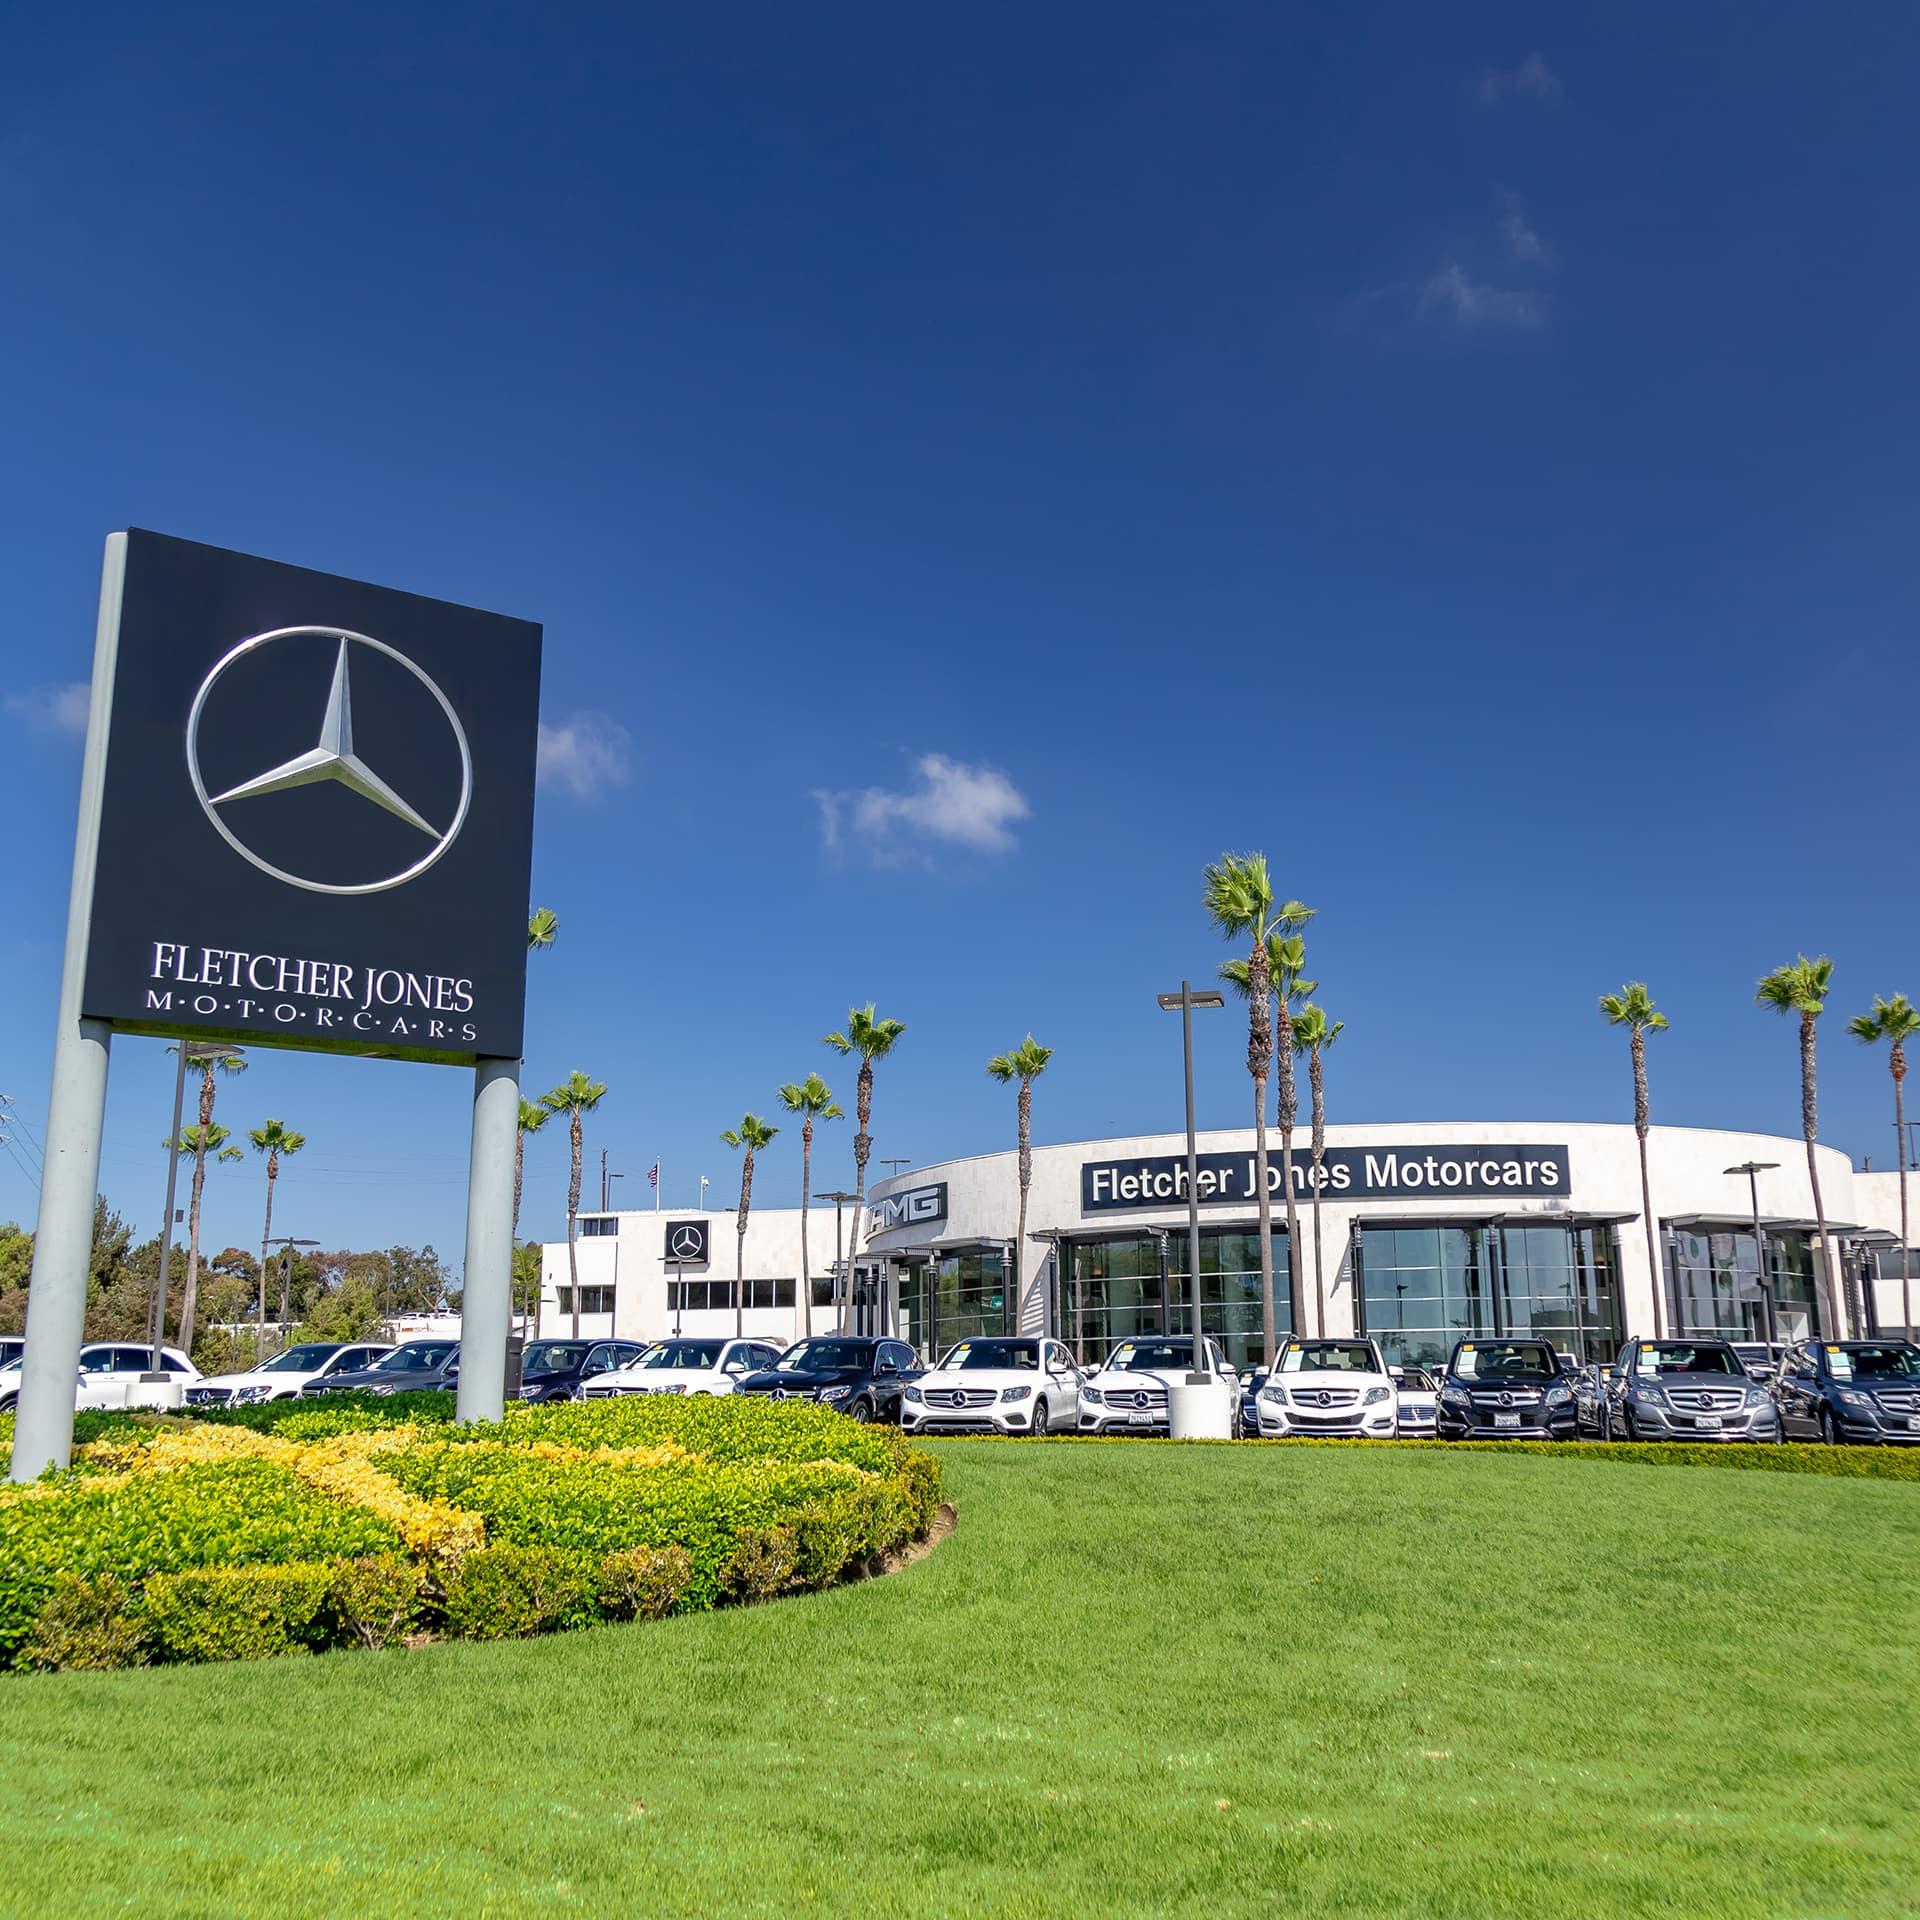 Fletcher Jones Motorcars: The Nation's #1 Mercedes-Benz